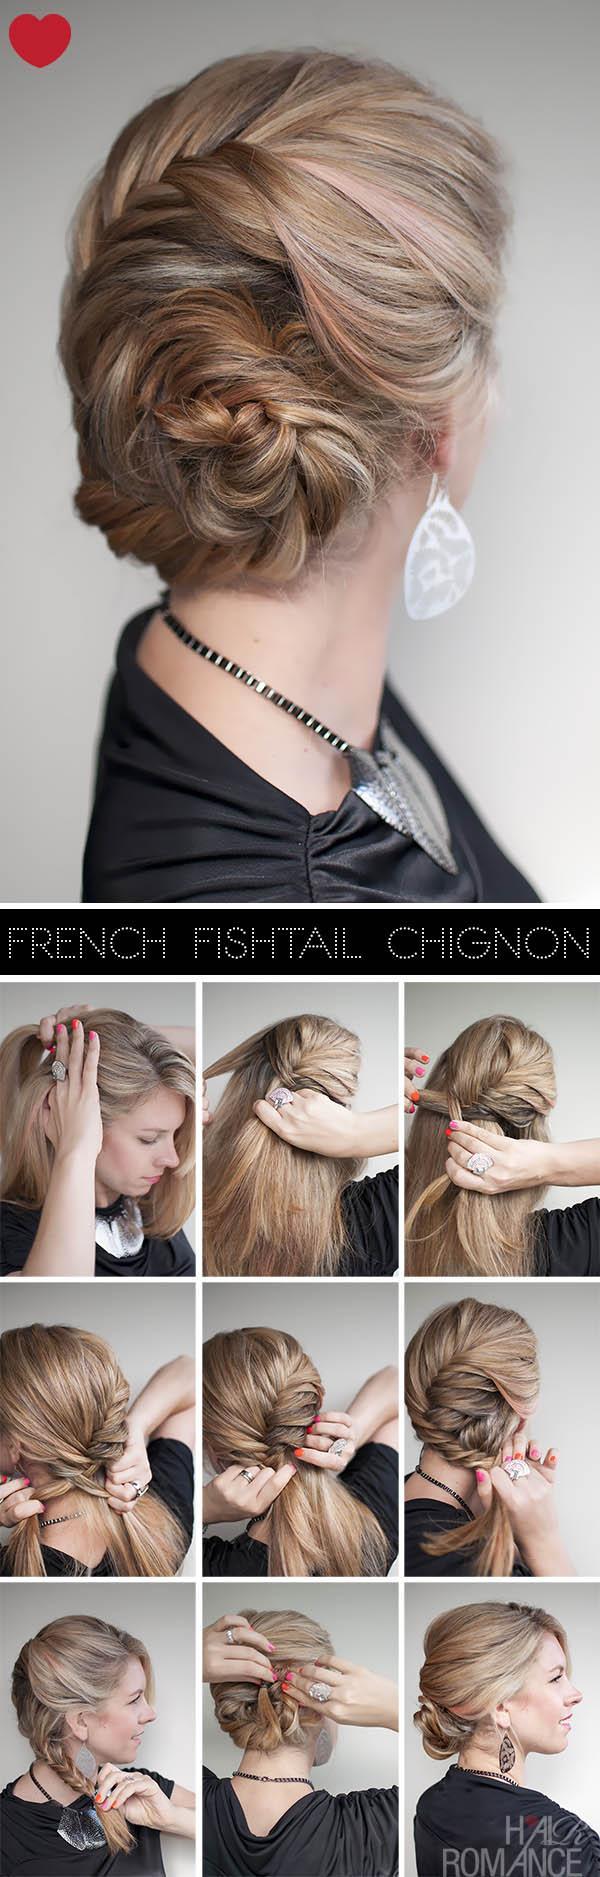 Wedding - French Fishtail Braid Hairstyle Tutorial